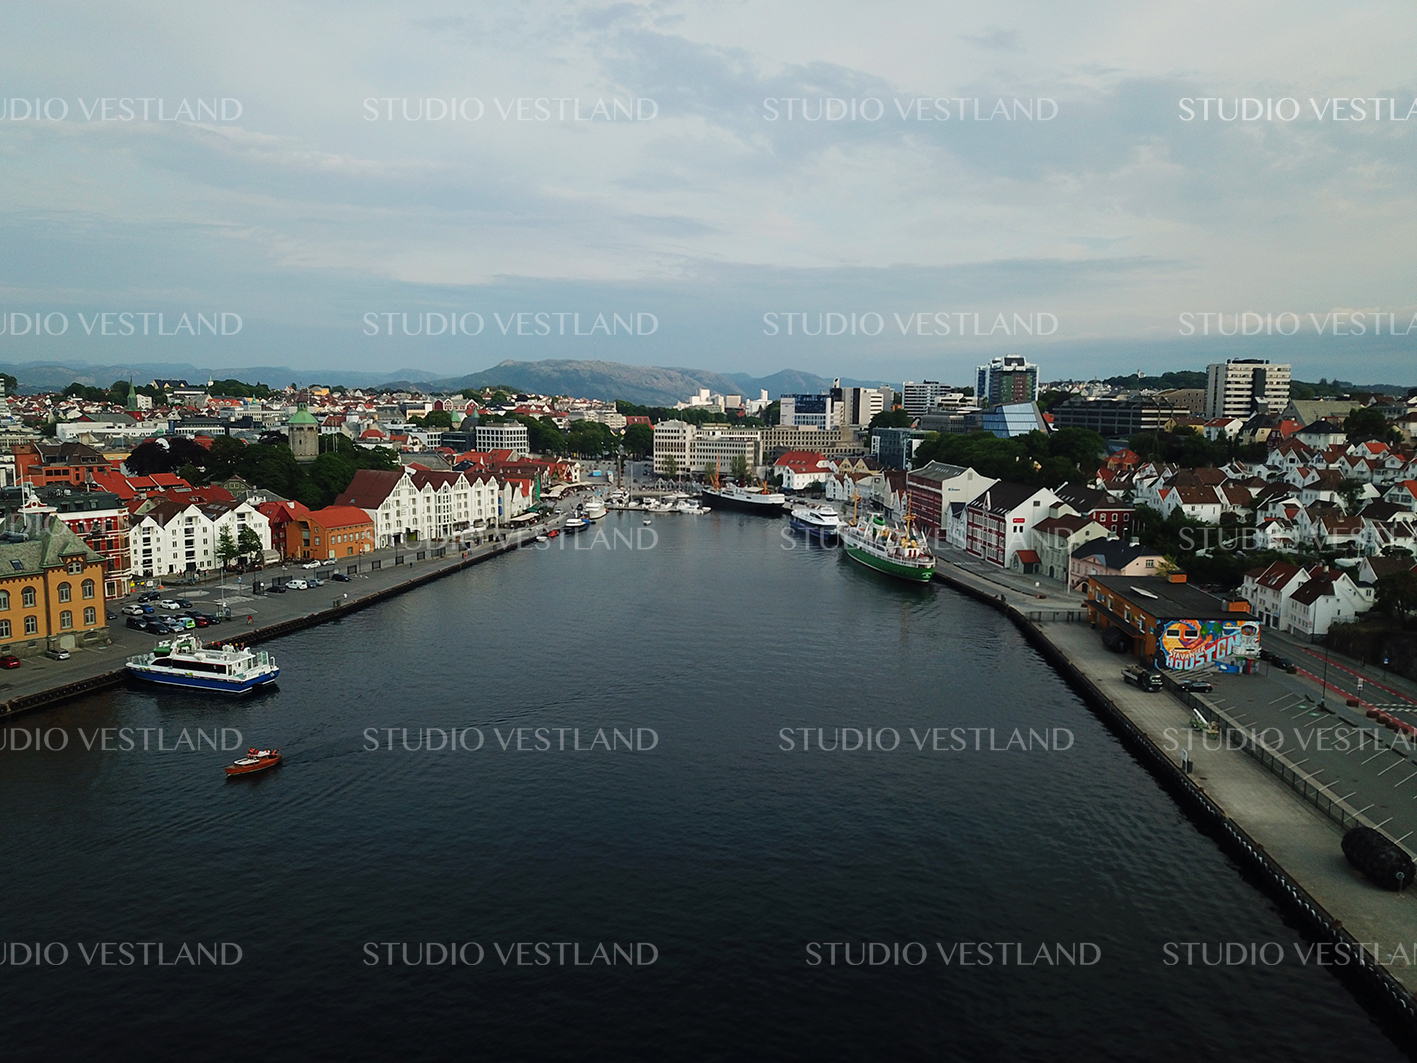 Studio Vestland - Stavanger 31